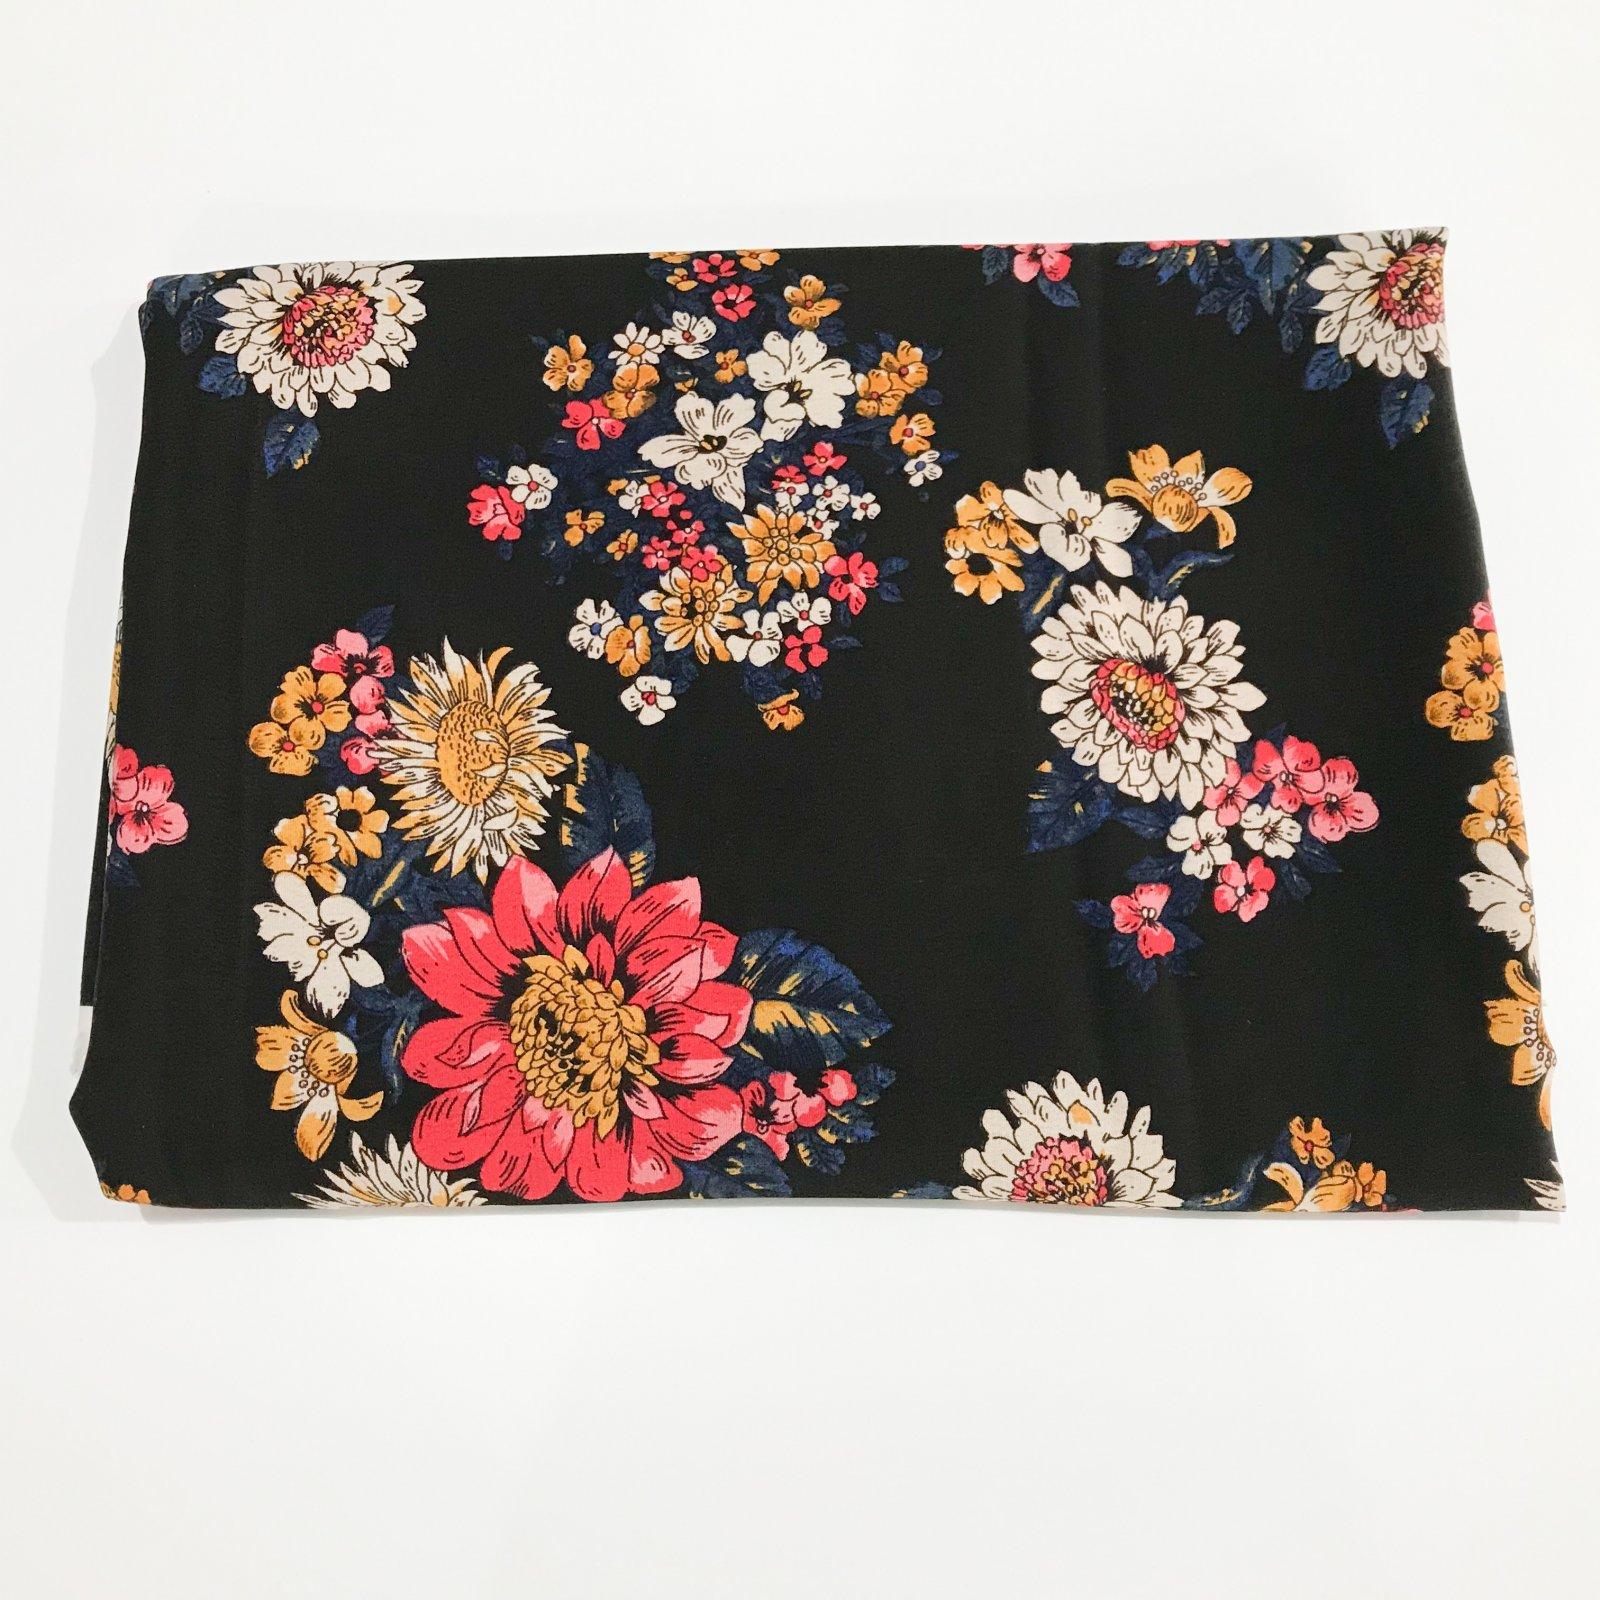 3 yards - Tencel Crepe - Japanese Sunflower